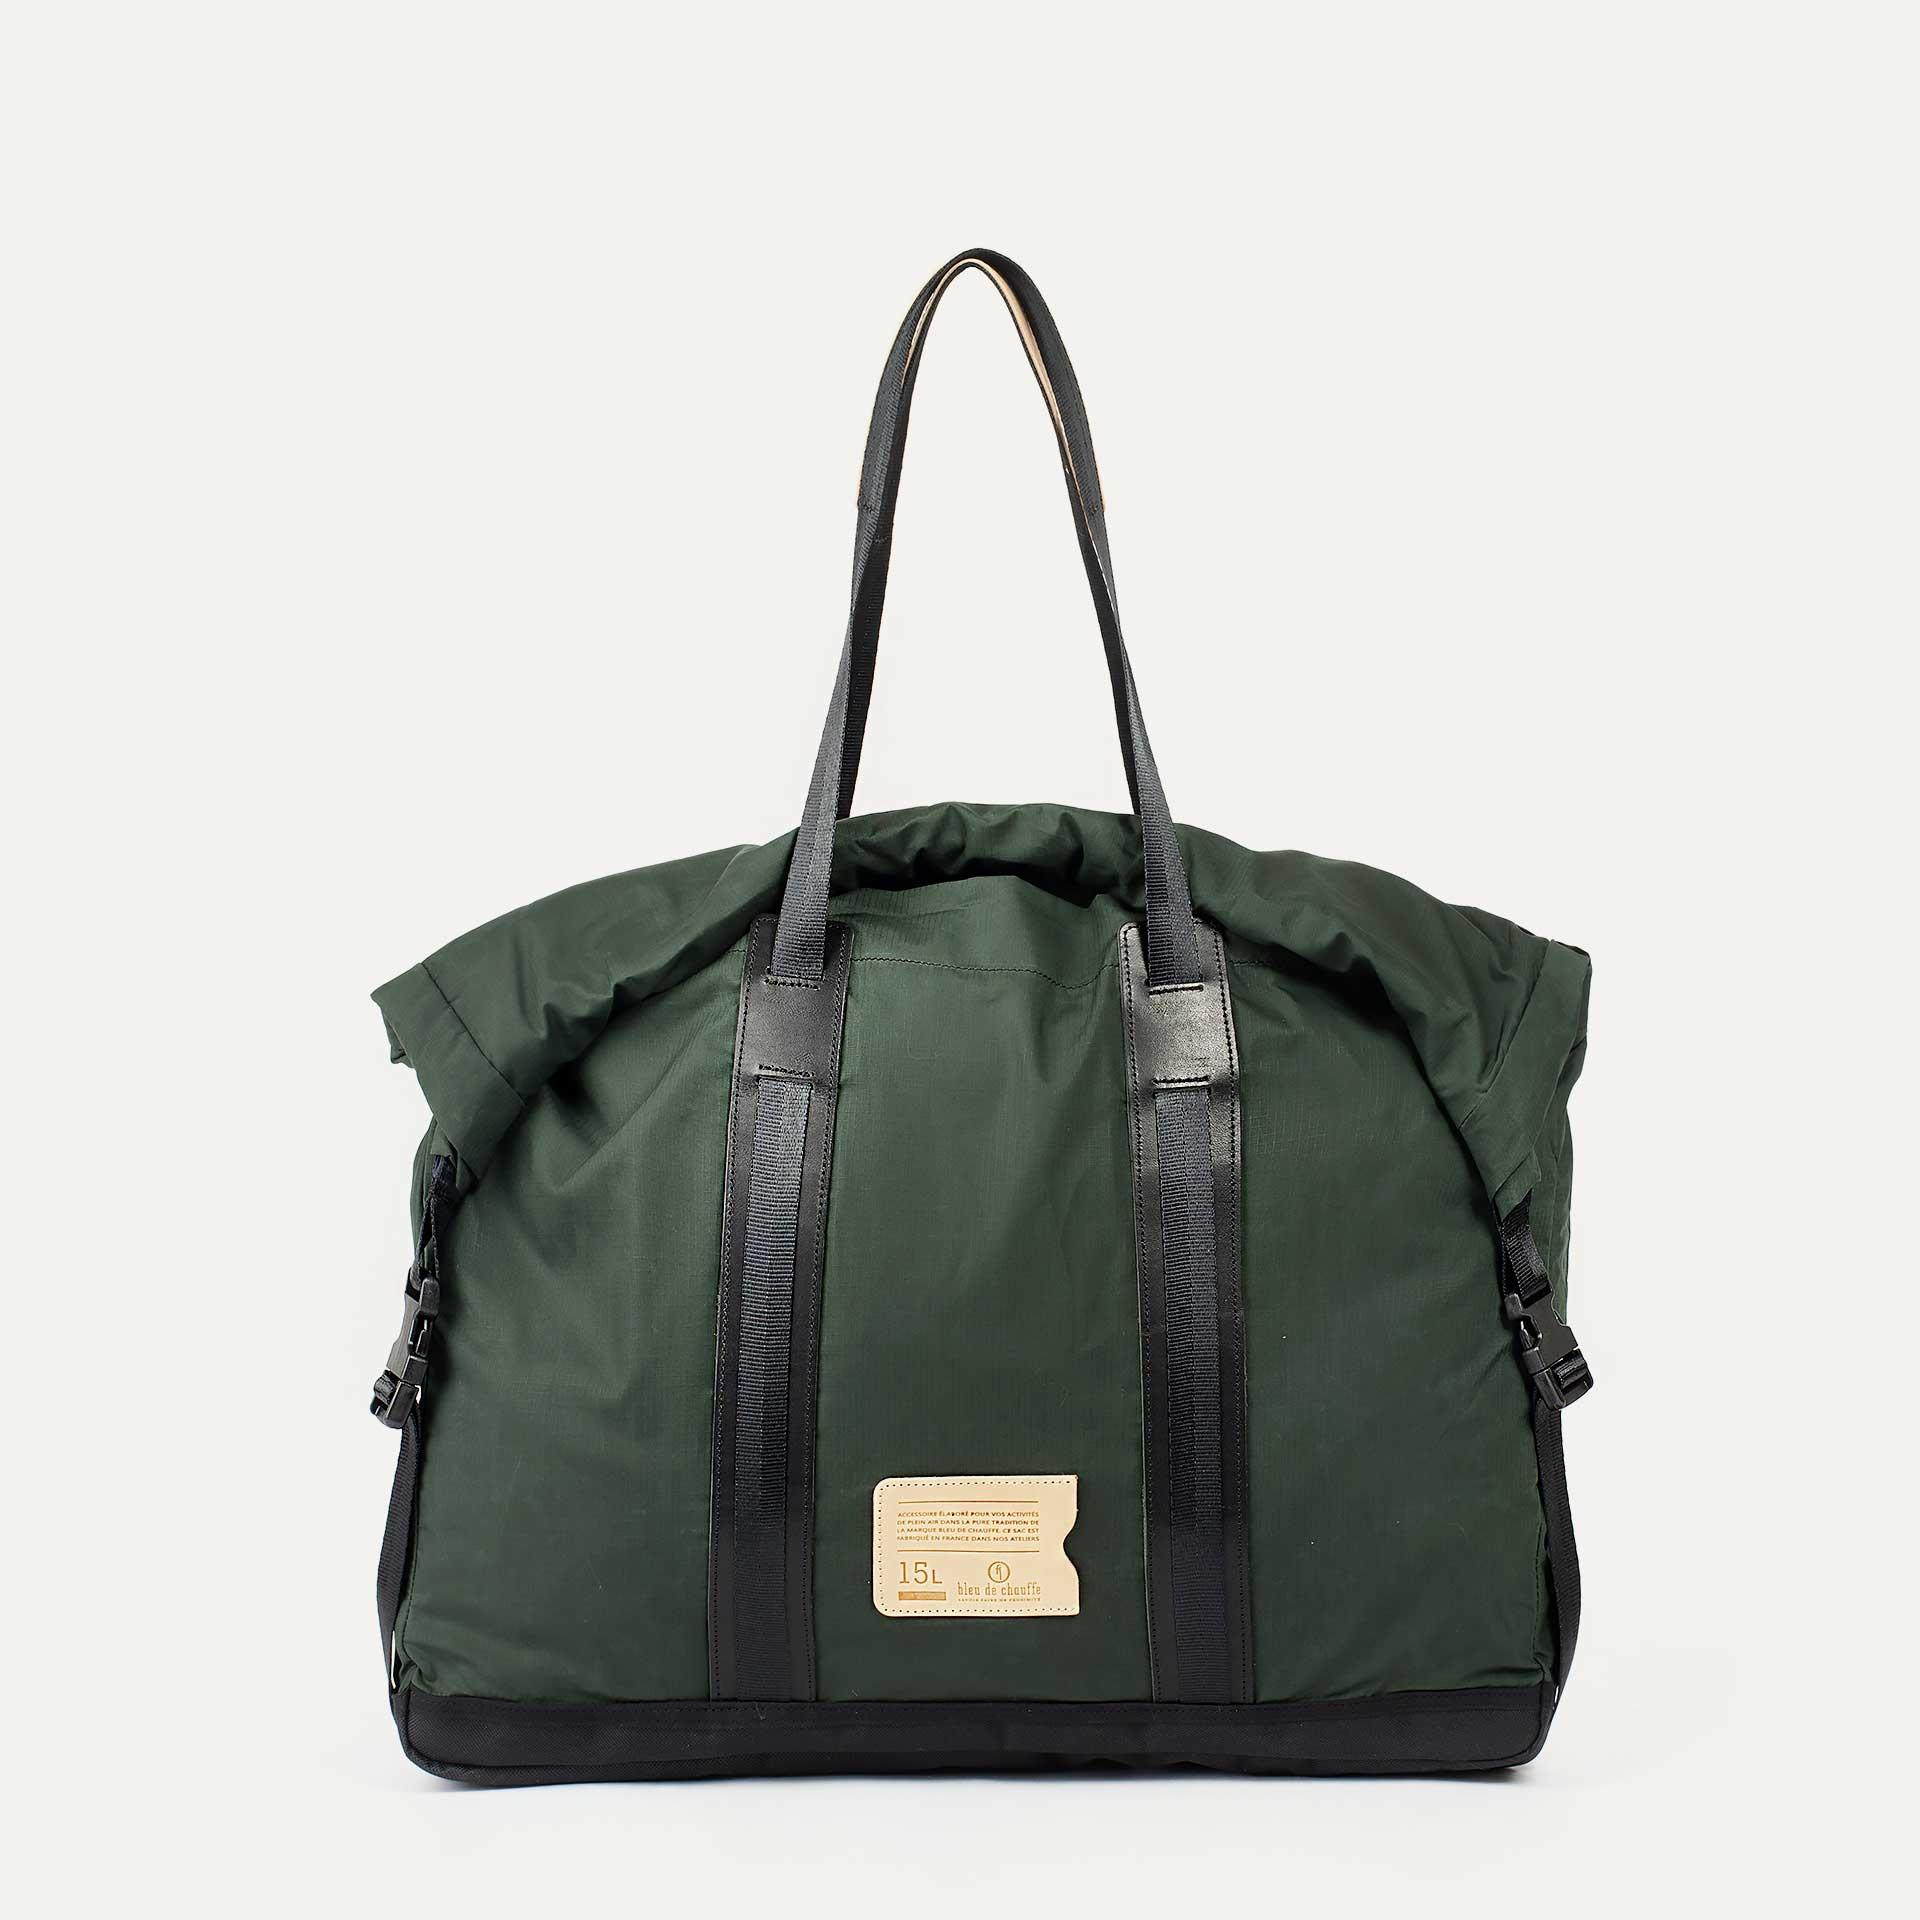 15L Barda Tote bag - Dark Khaki (image n°1)